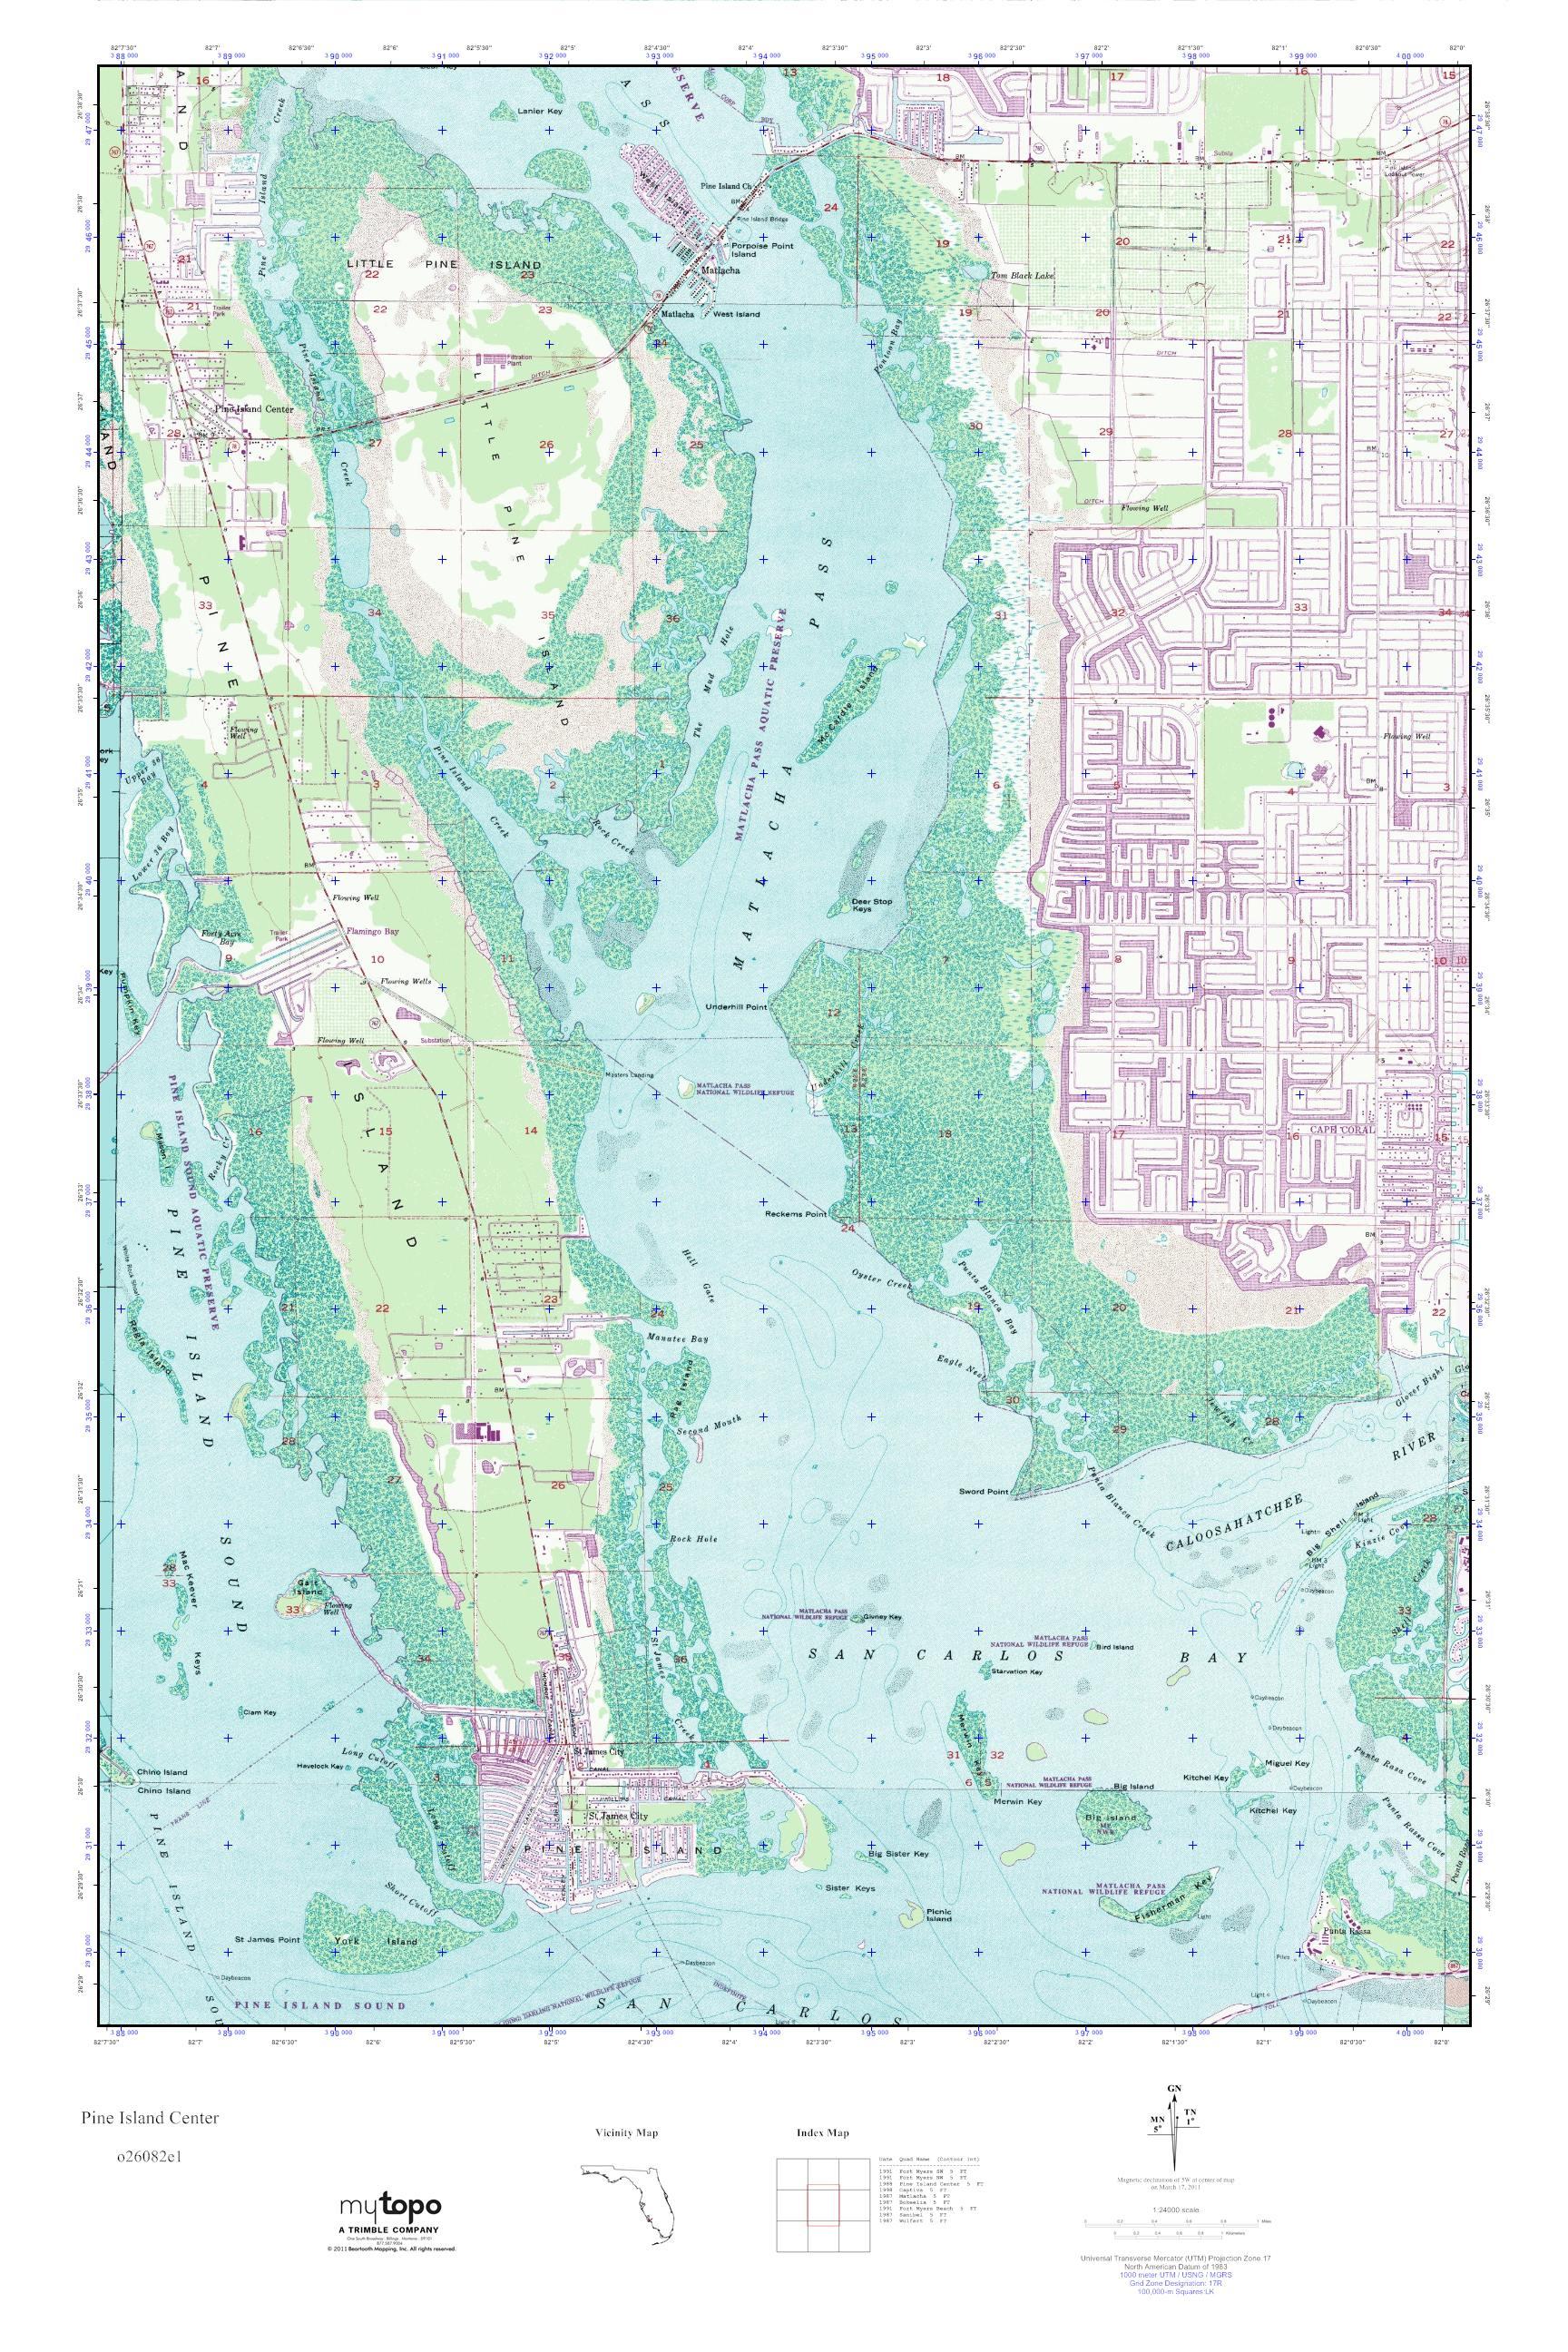 MyTopo Pine Island Center, Florida USGS Quad Topo Map